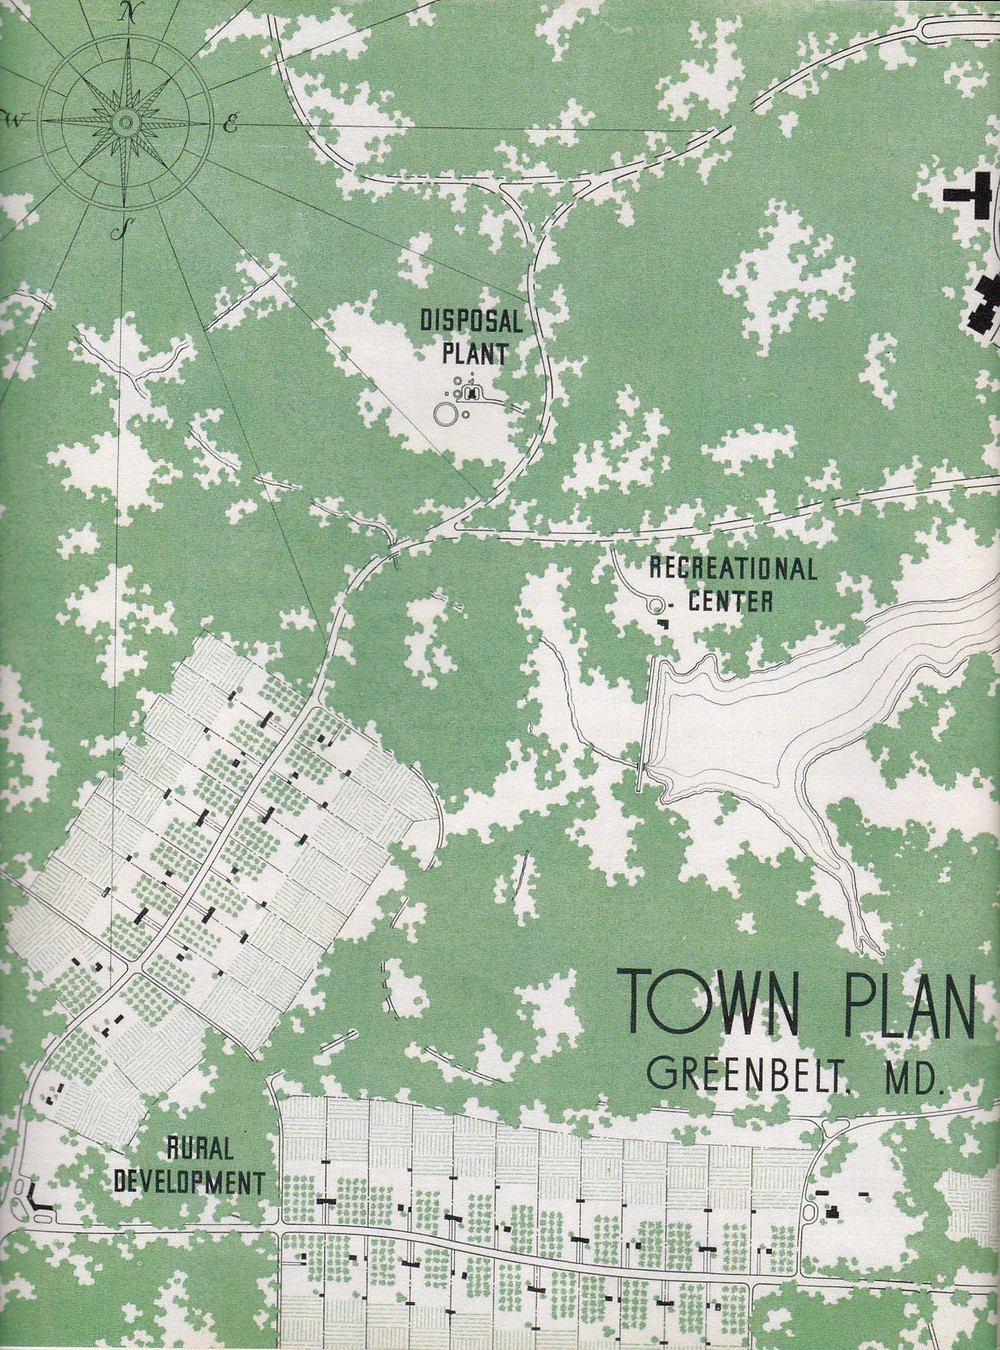 Town plan of Greenbelt with Rossville development